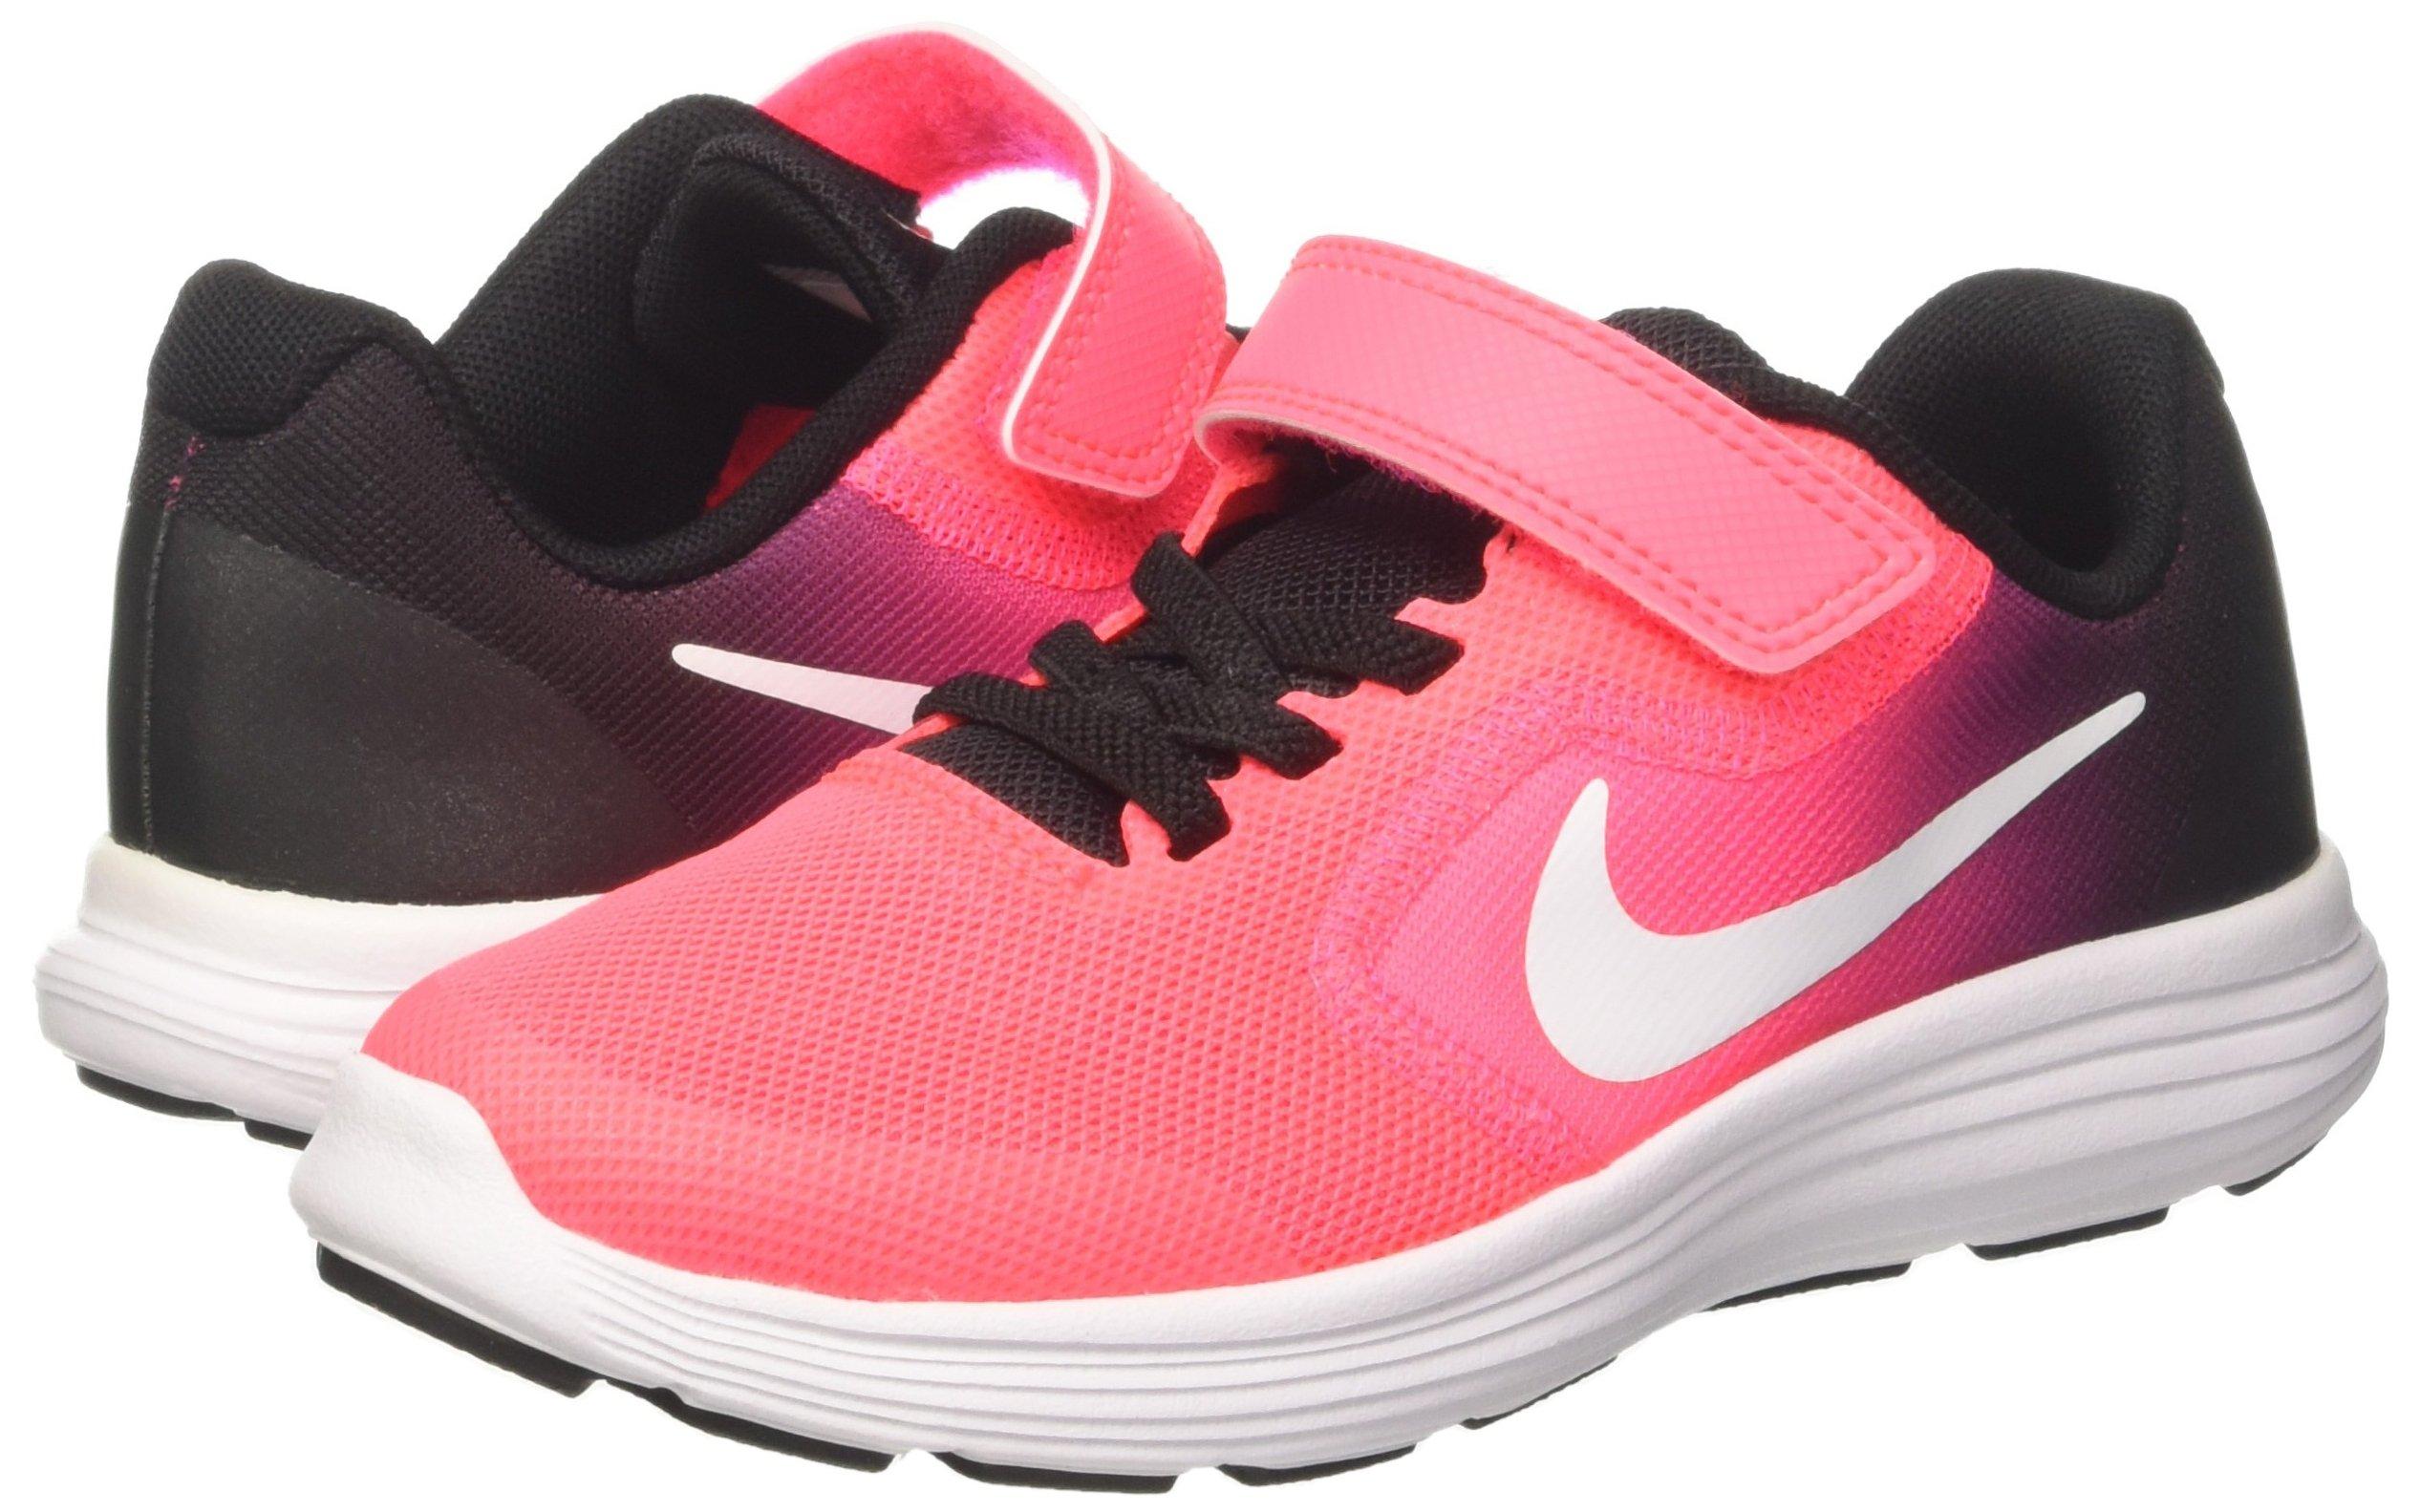 NIKE Kids' Revolution 3 (Psv) Running-Shoes, Black/White/Racer Pink/Black, 1.5 M US Little Kid by Nike (Image #5)